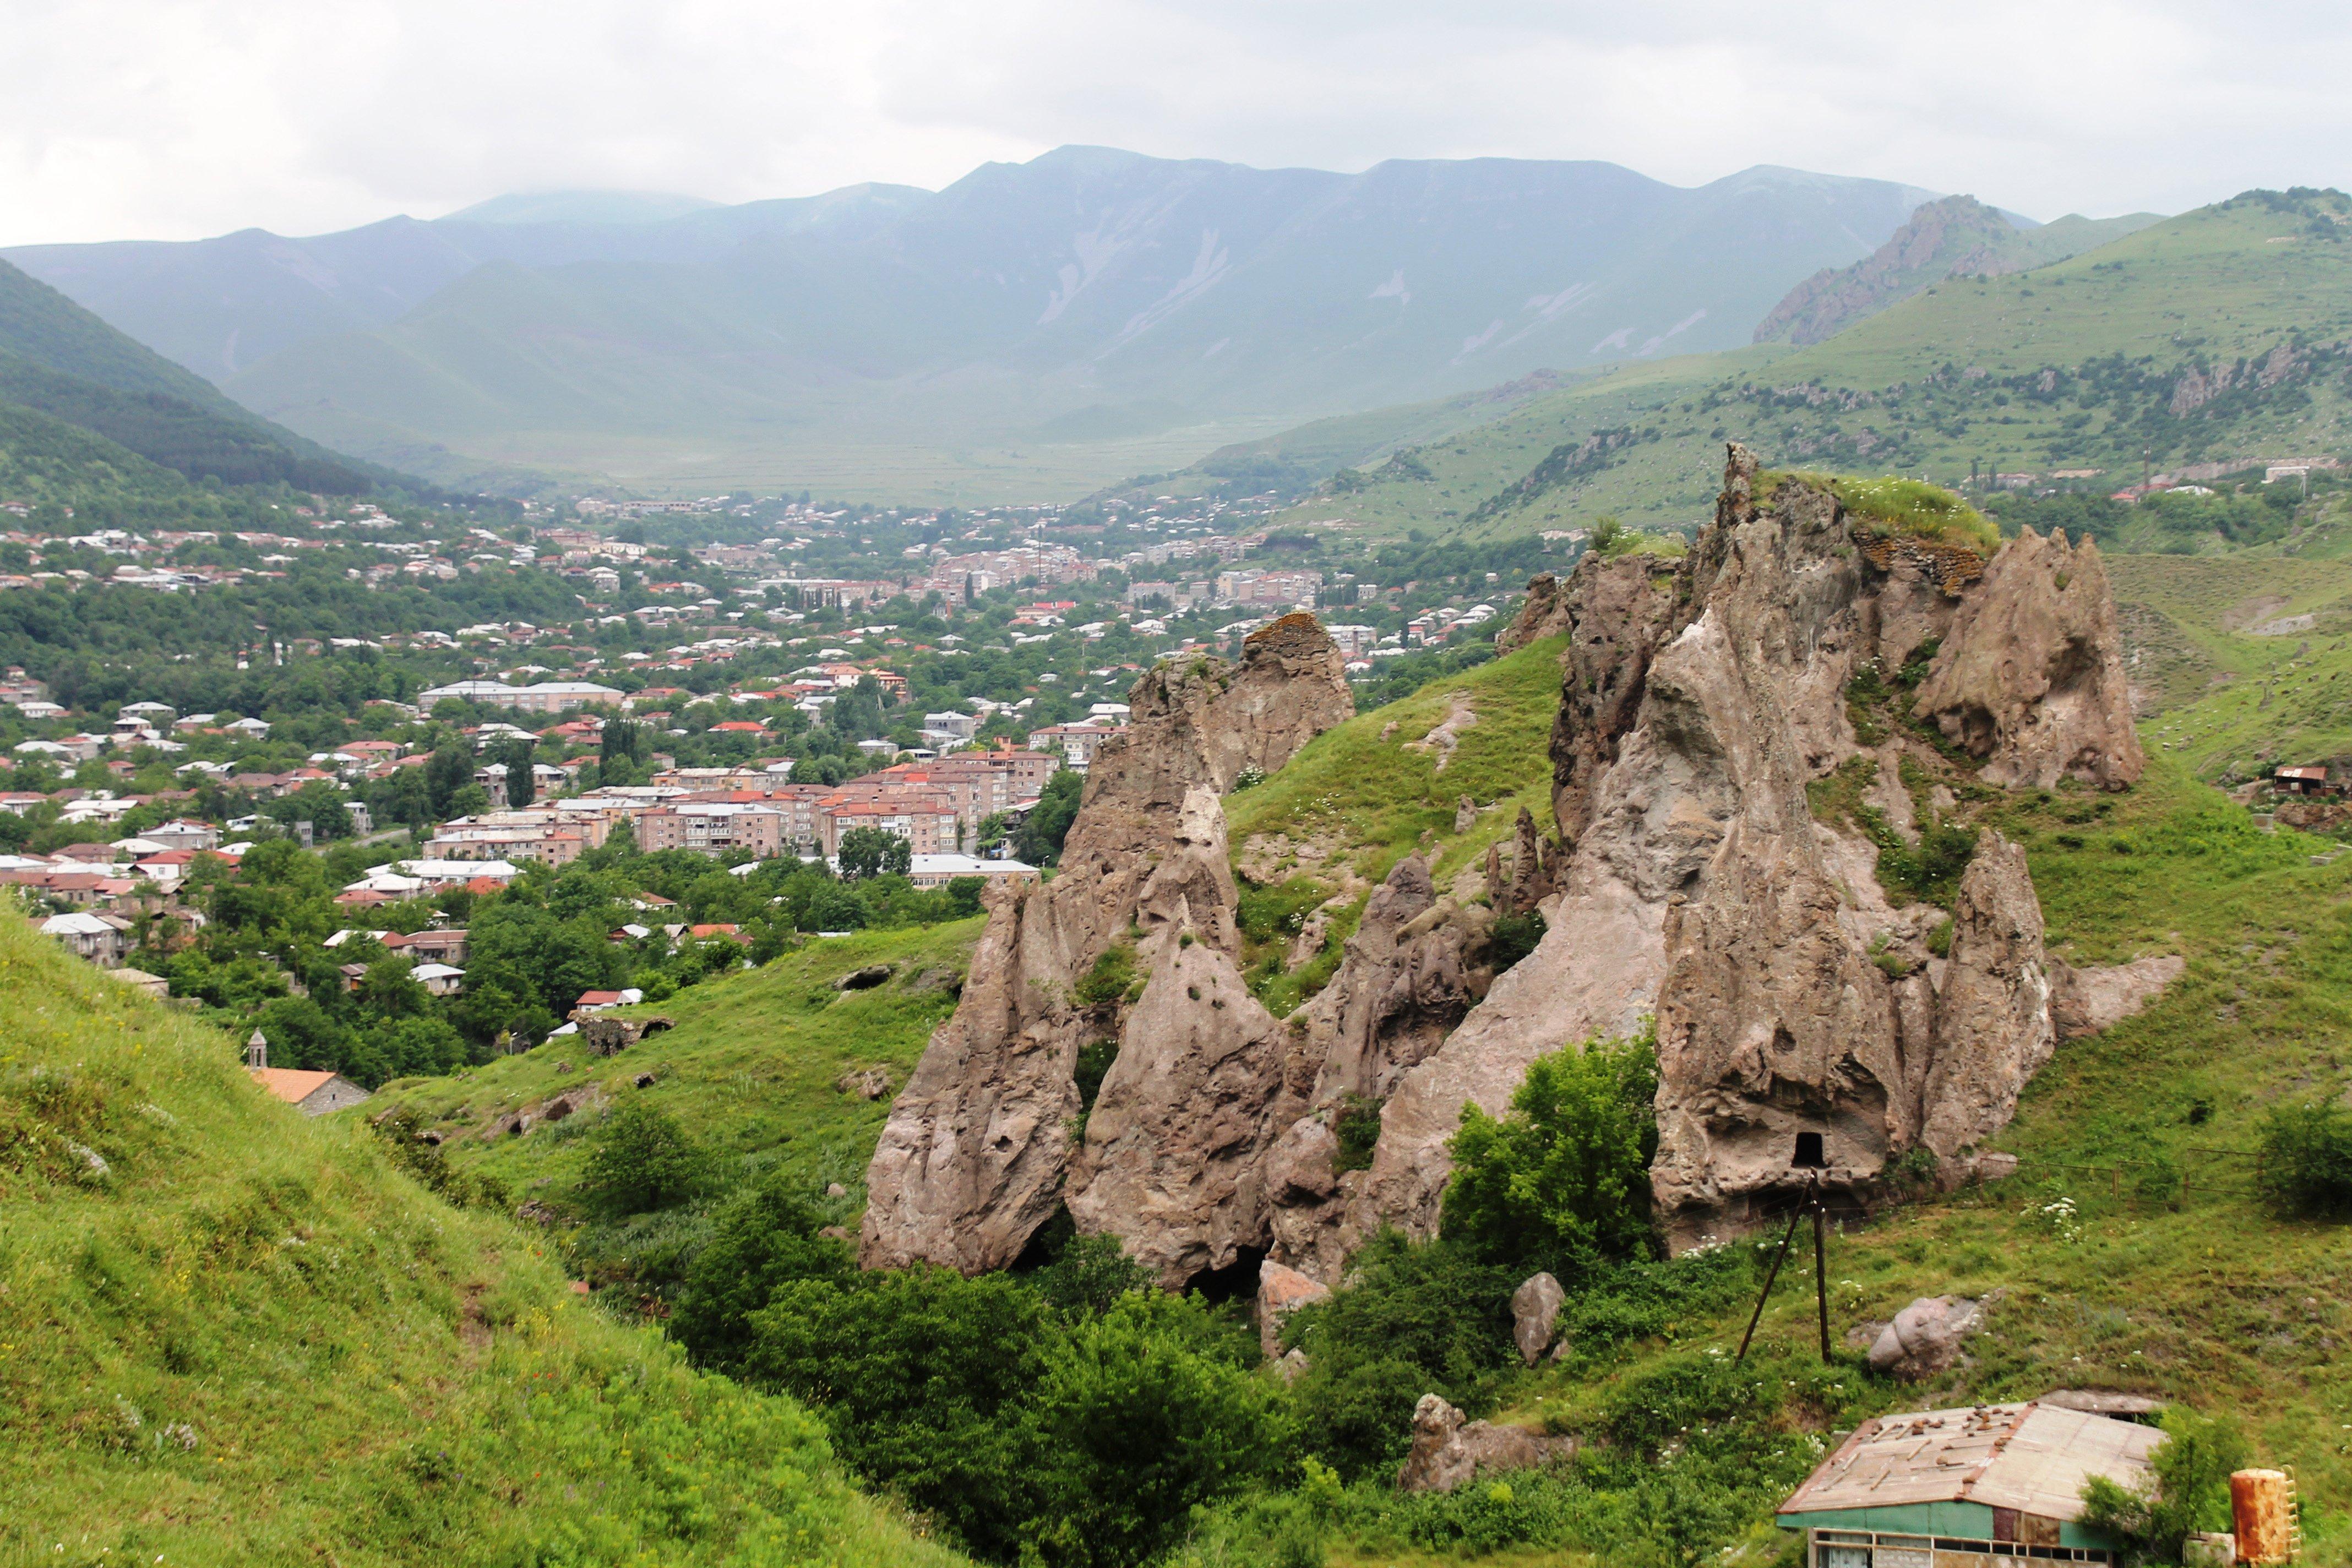 Troglodyte洞穴住宅位于亚美尼亚南部的Goris镇上方。照片:Diana Noonan